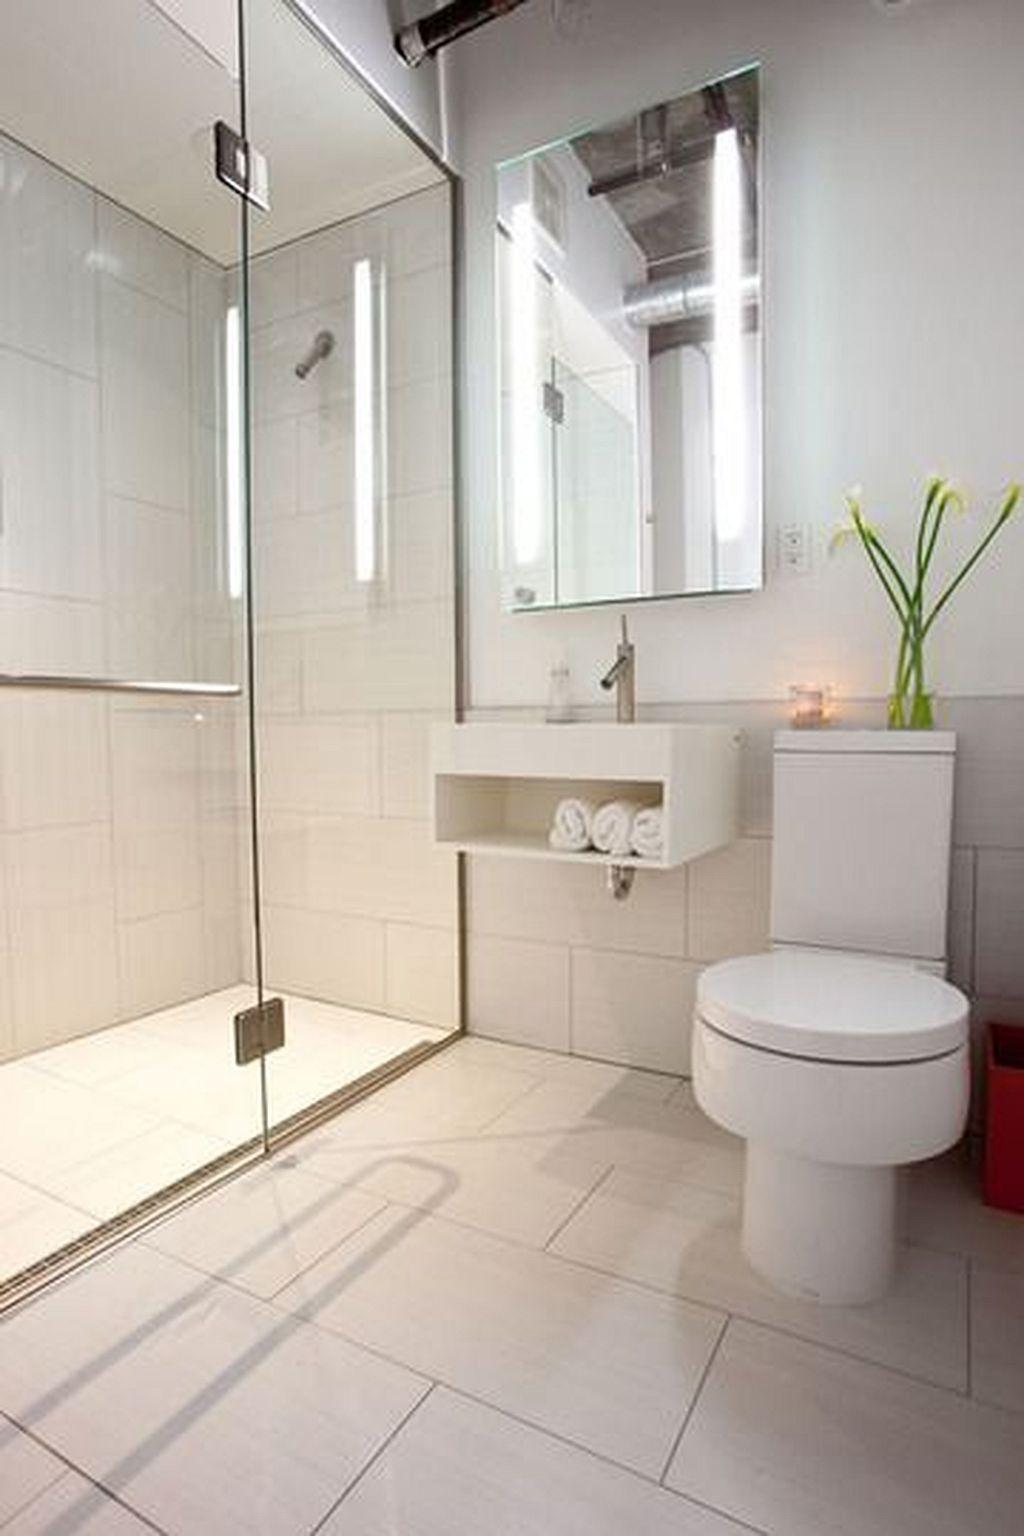 Awesome 30 Incredible Modern Bathroom Shower Ideas For Small Bathroom Https Garde Modern Small Bathrooms Cheap Bathroom Remodel Bathroom Design Small Modern